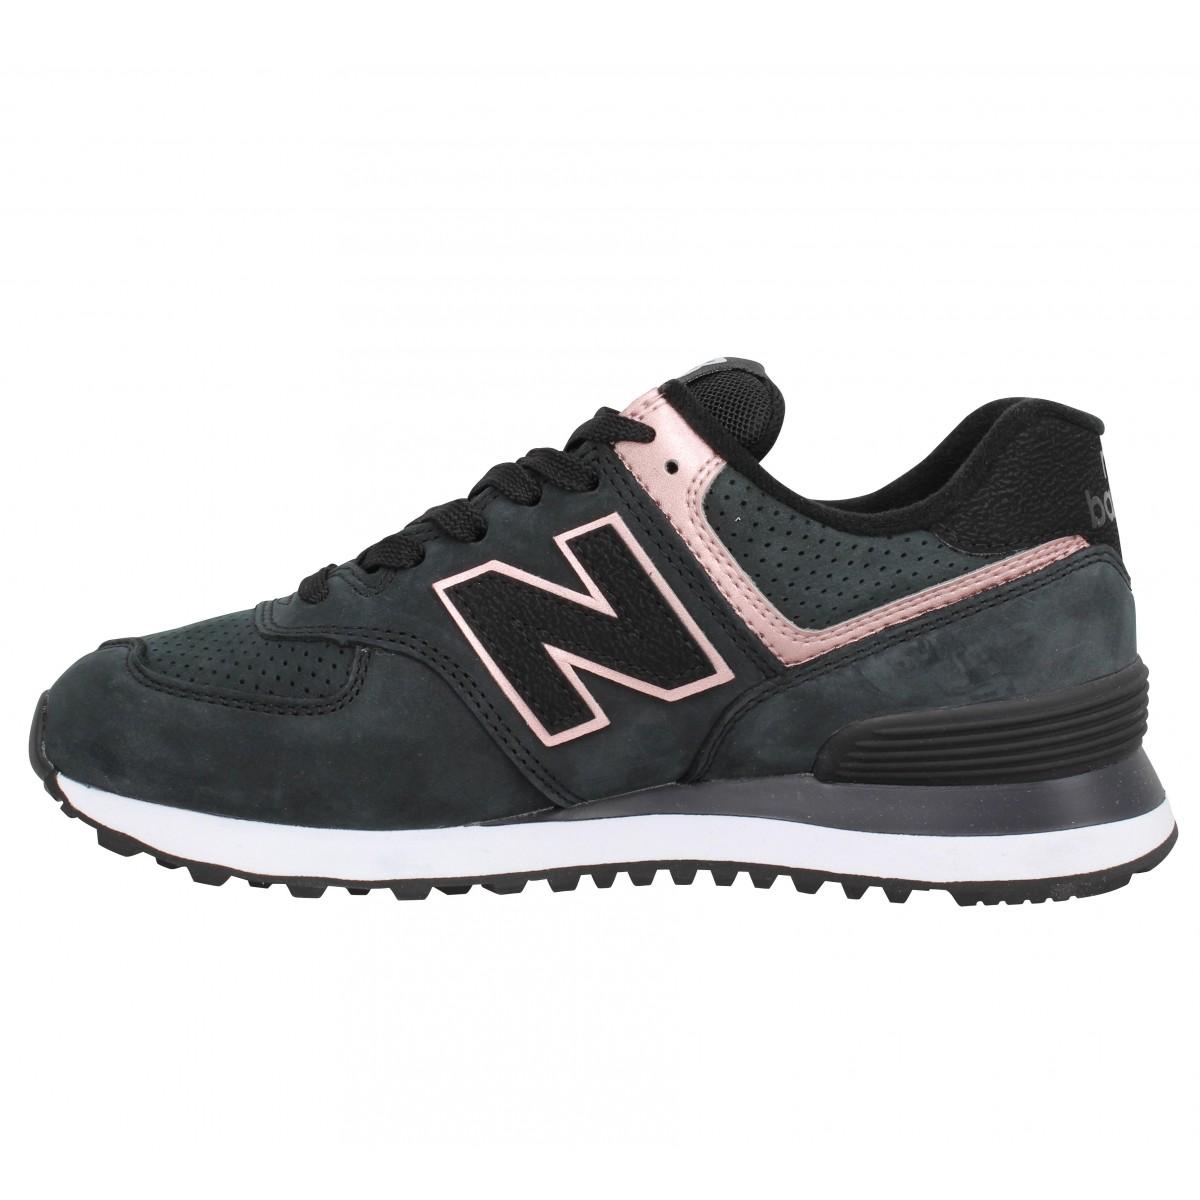 Noir Nubuck Balance New 574 Fanny Femme Chaussures Rqxpzwaxr JTKcFl1